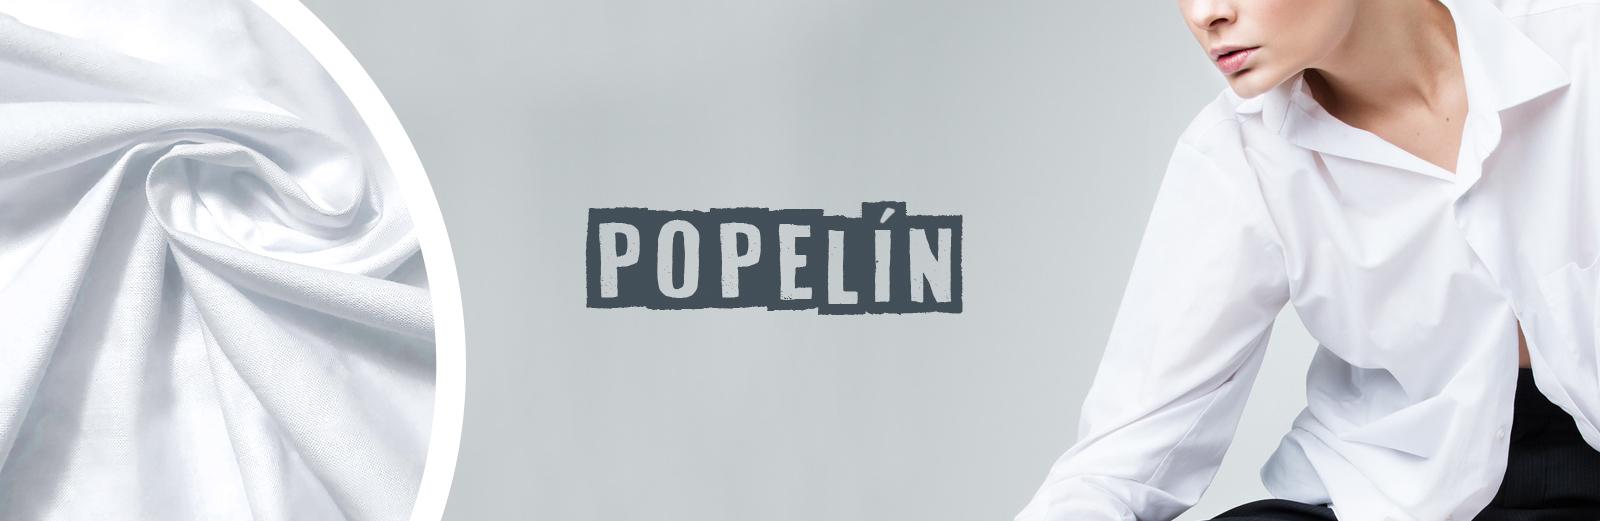 TELAS DE POPELIN